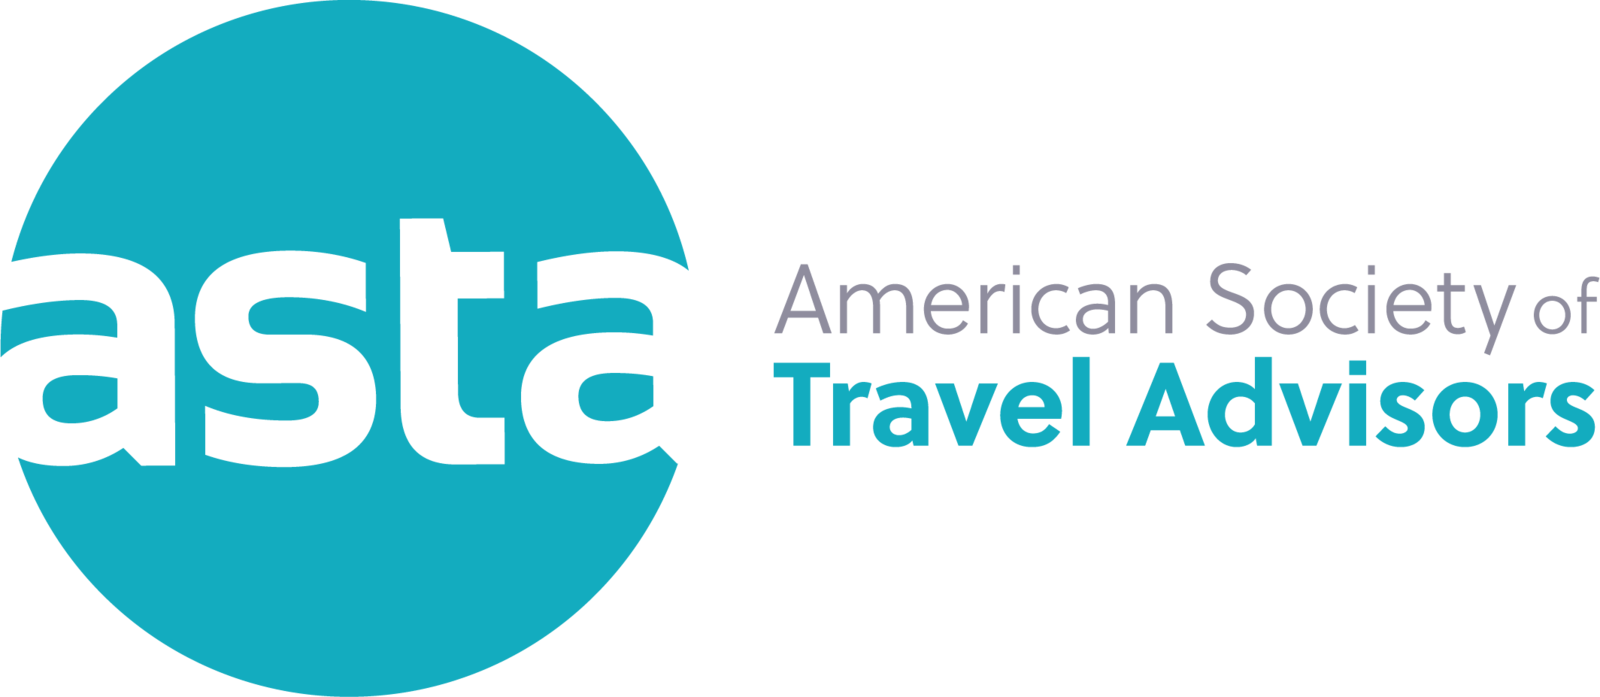 American Society of Travel Advisors (ASTA) logo